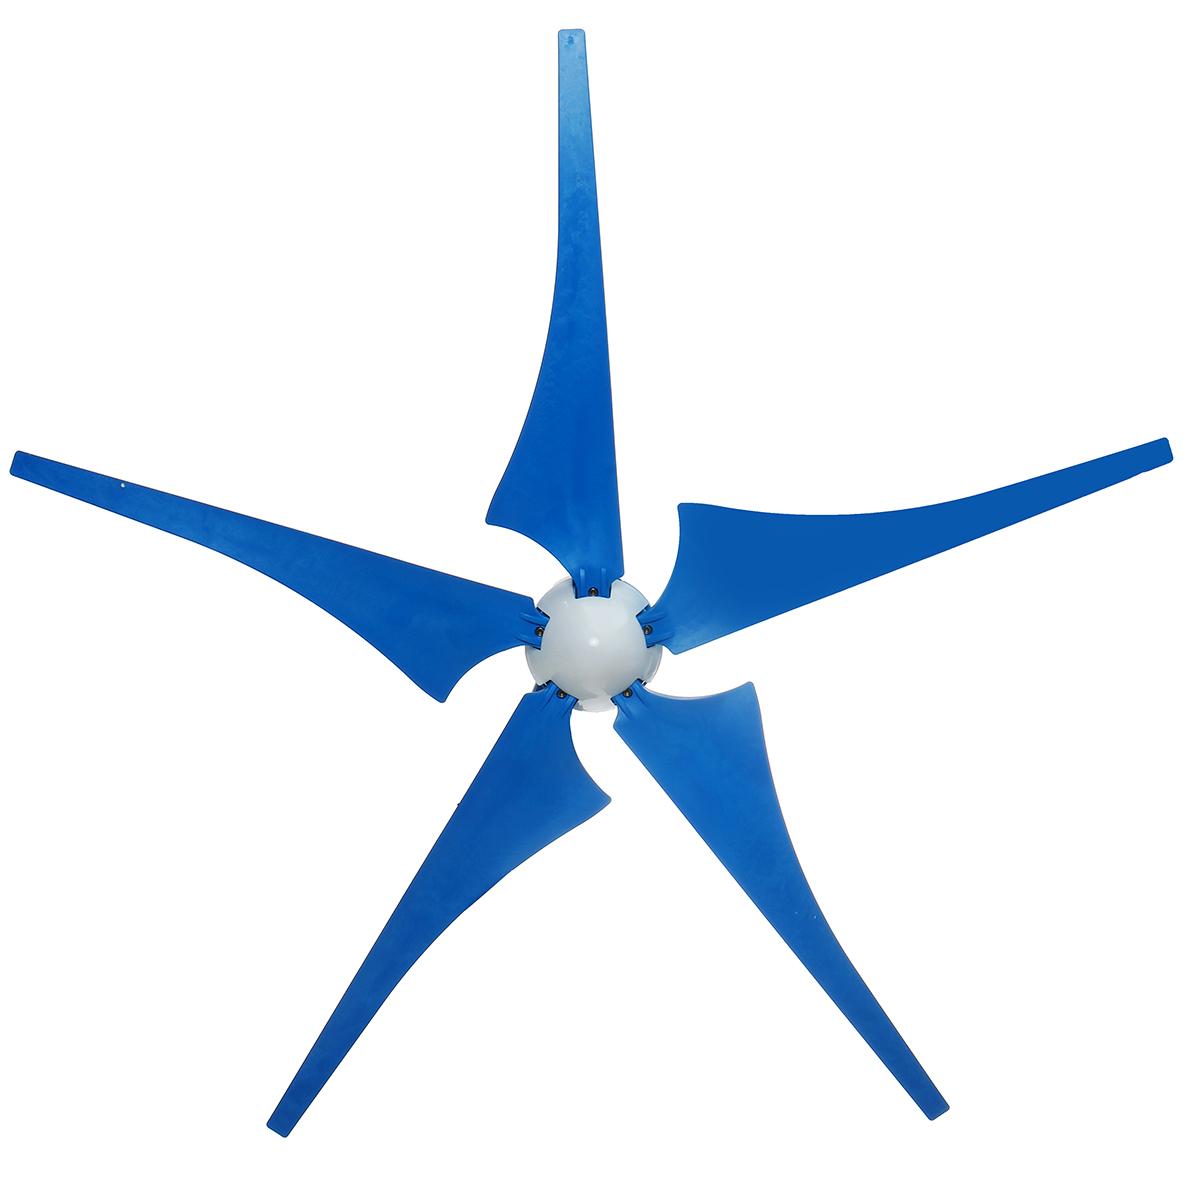 500W/1000W Wind Turbine Generator DC 12V 5 Blades Wind Turbine Generator Kit With Charge Controller